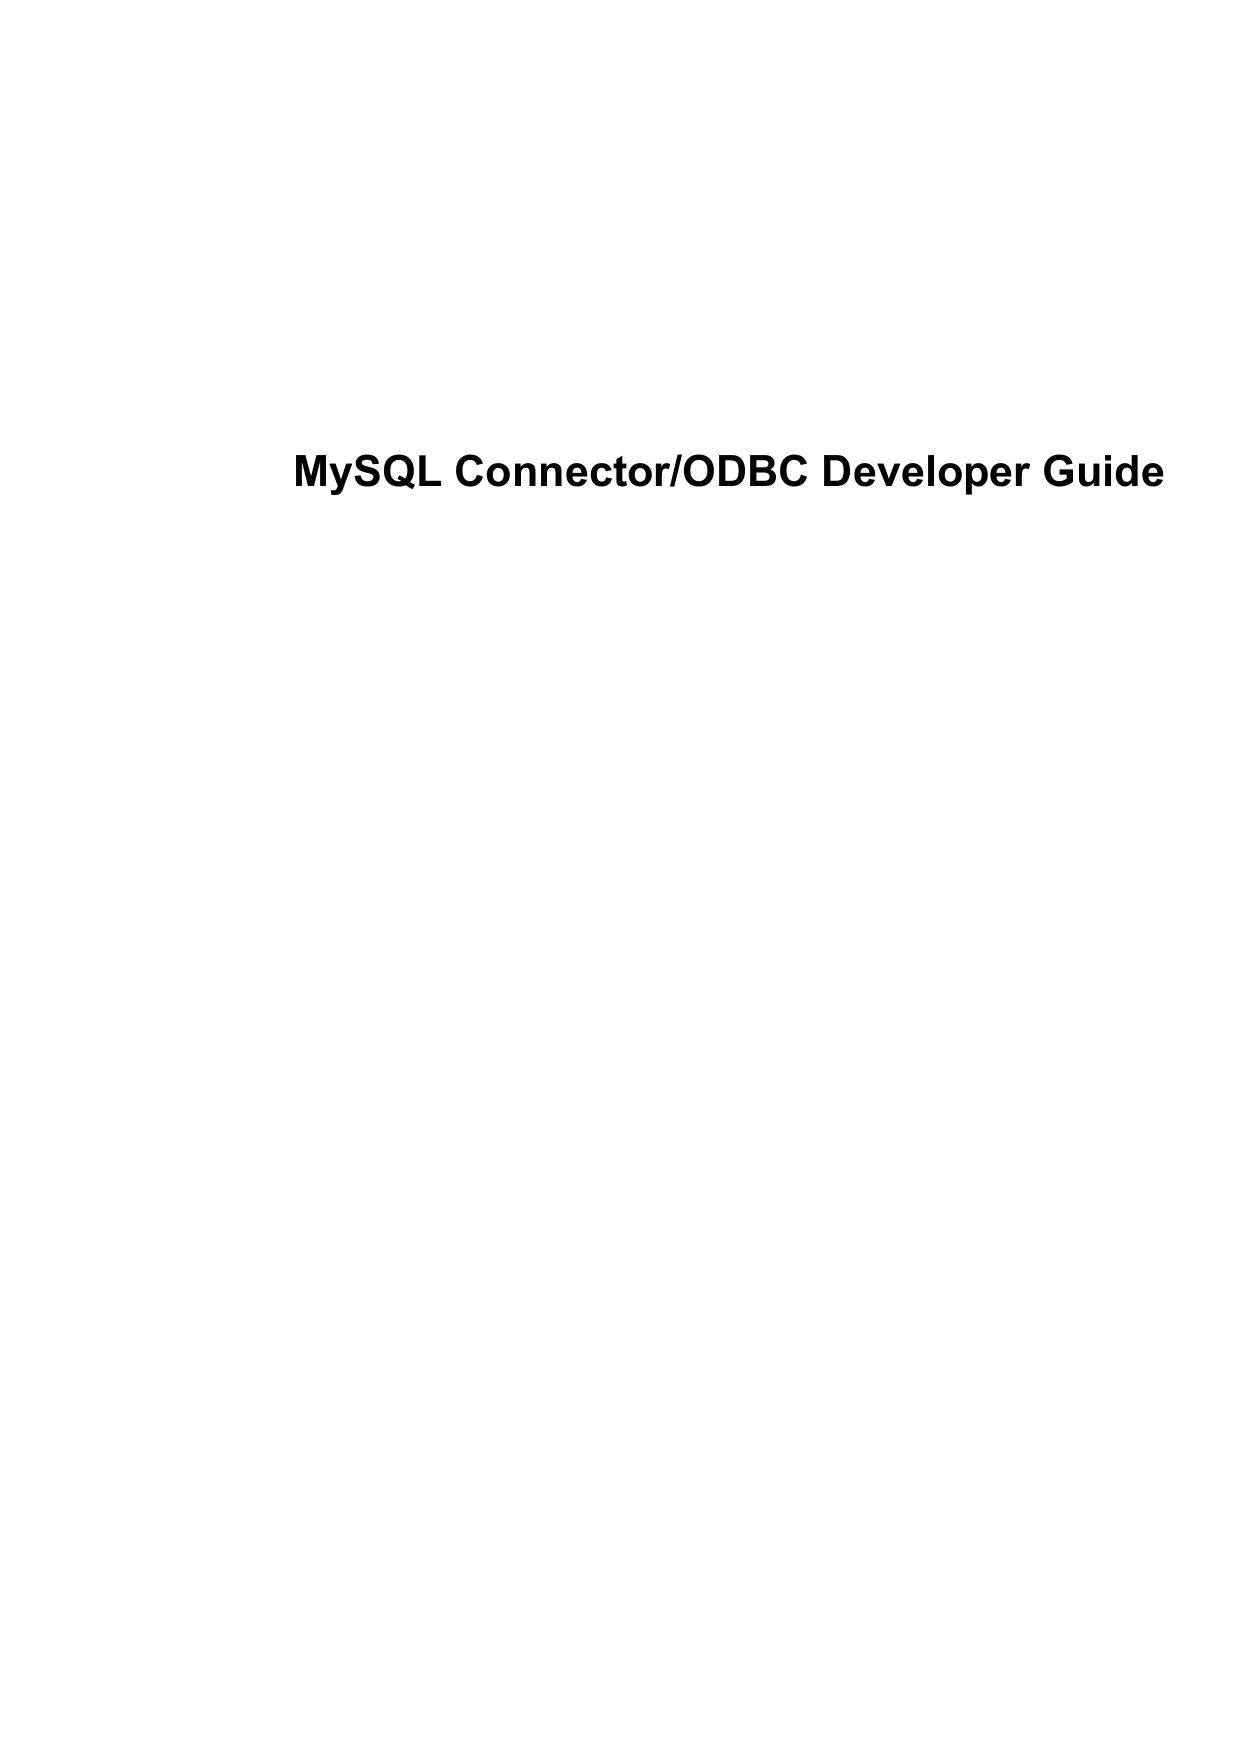 MySQL Connector/ODBC Developer Guide | manualzz com